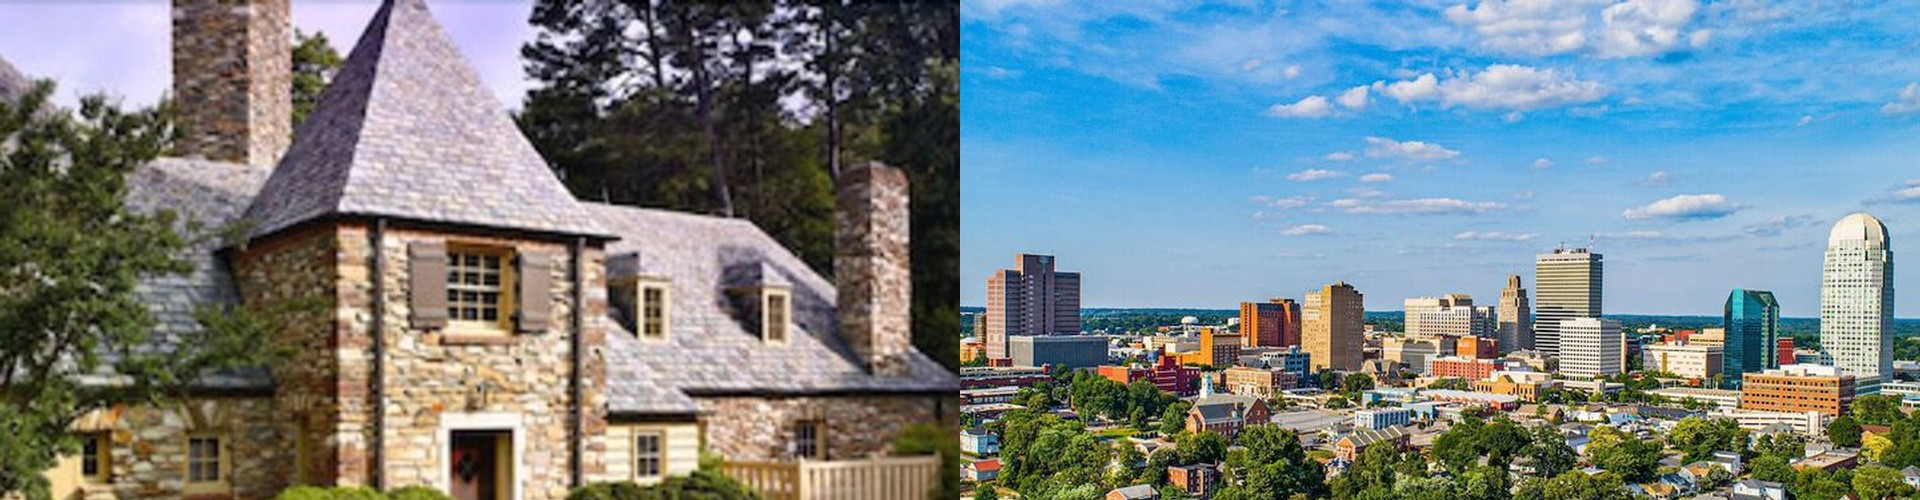 Best Winston Salem Meeting Hotels - Winston Salem (NC) Meeting Rooms